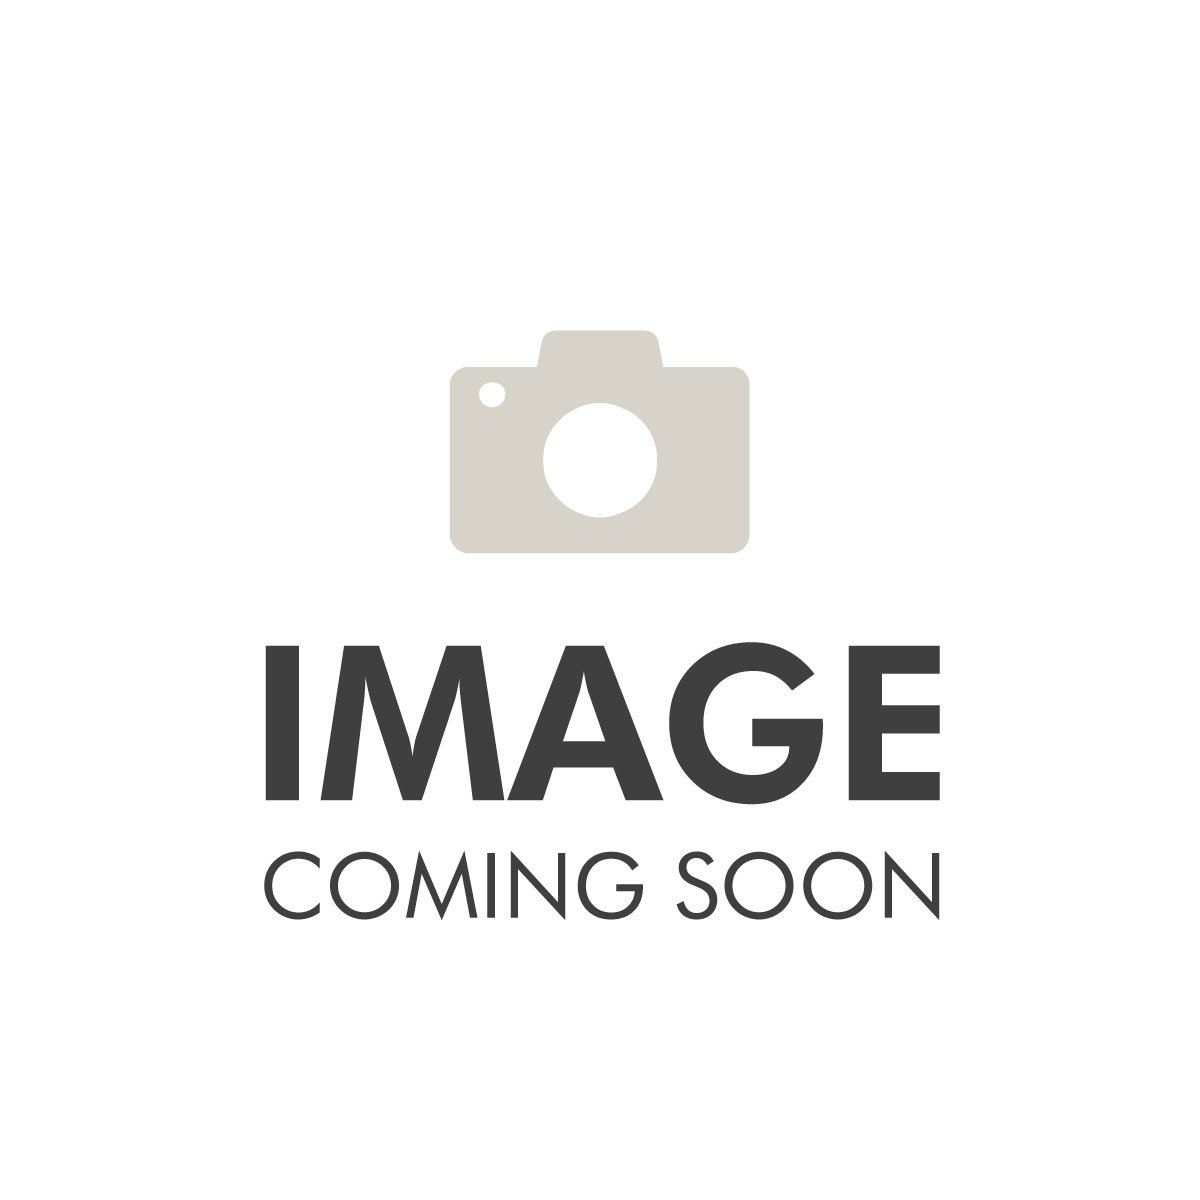 WS - Coquille de fleuret - Multicolore